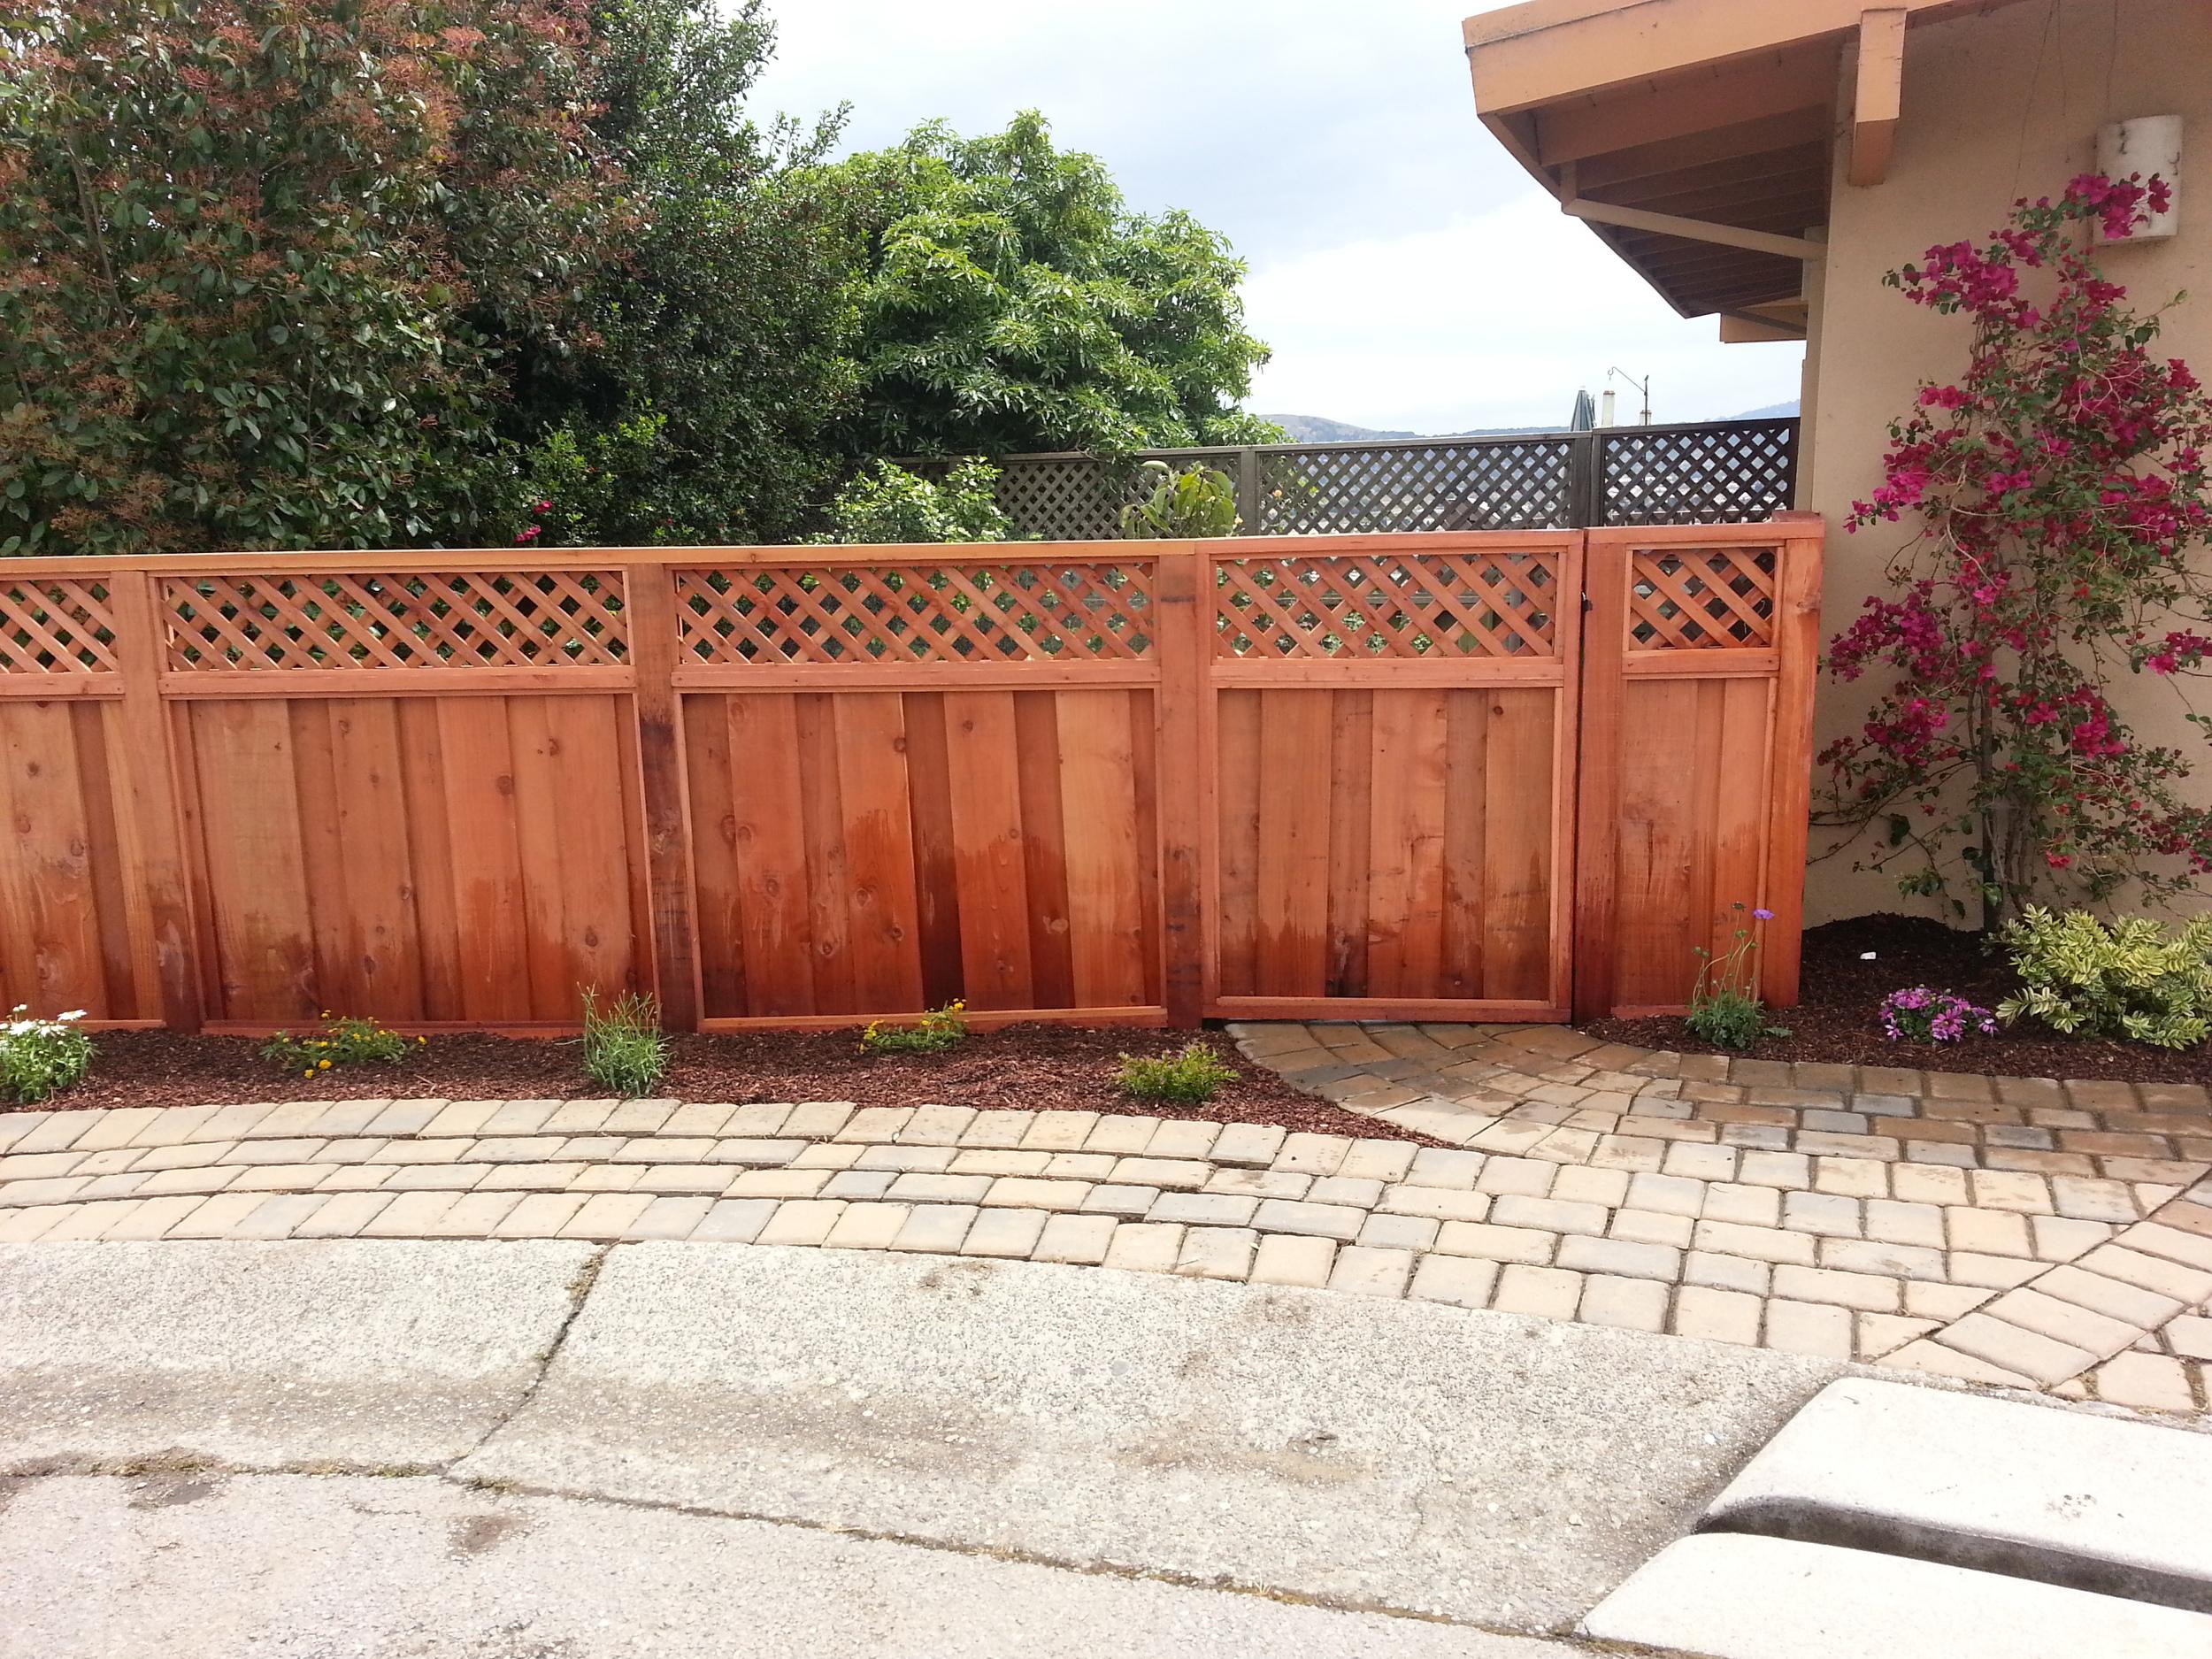 fence example 1.jpg